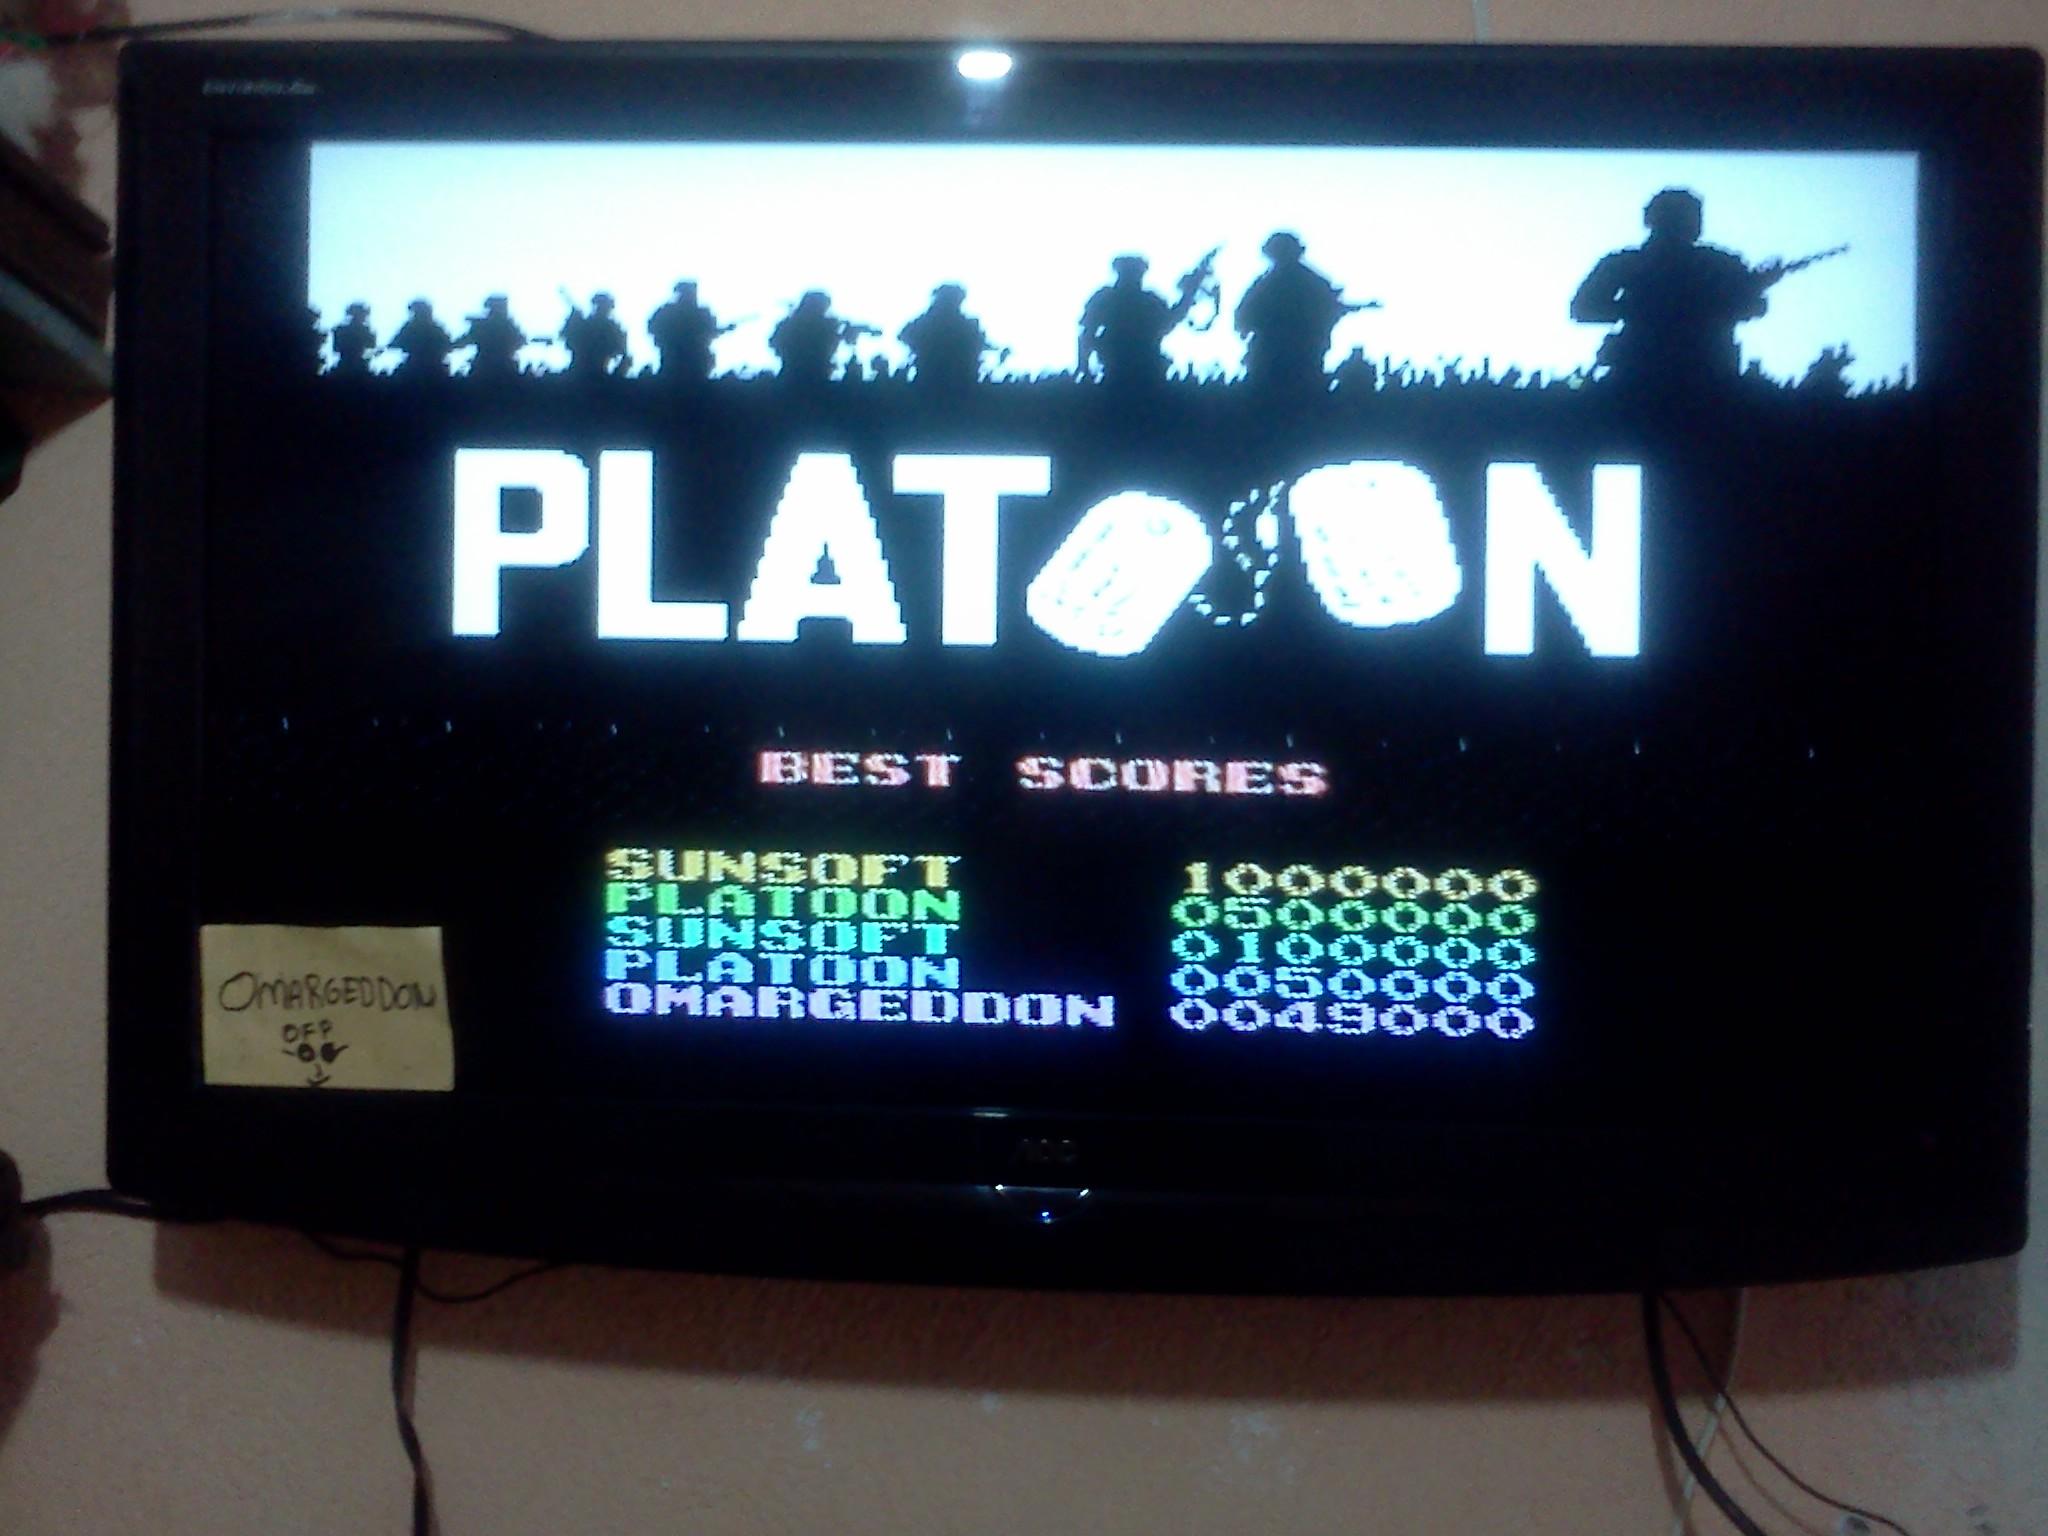 Platoon 49,000 points